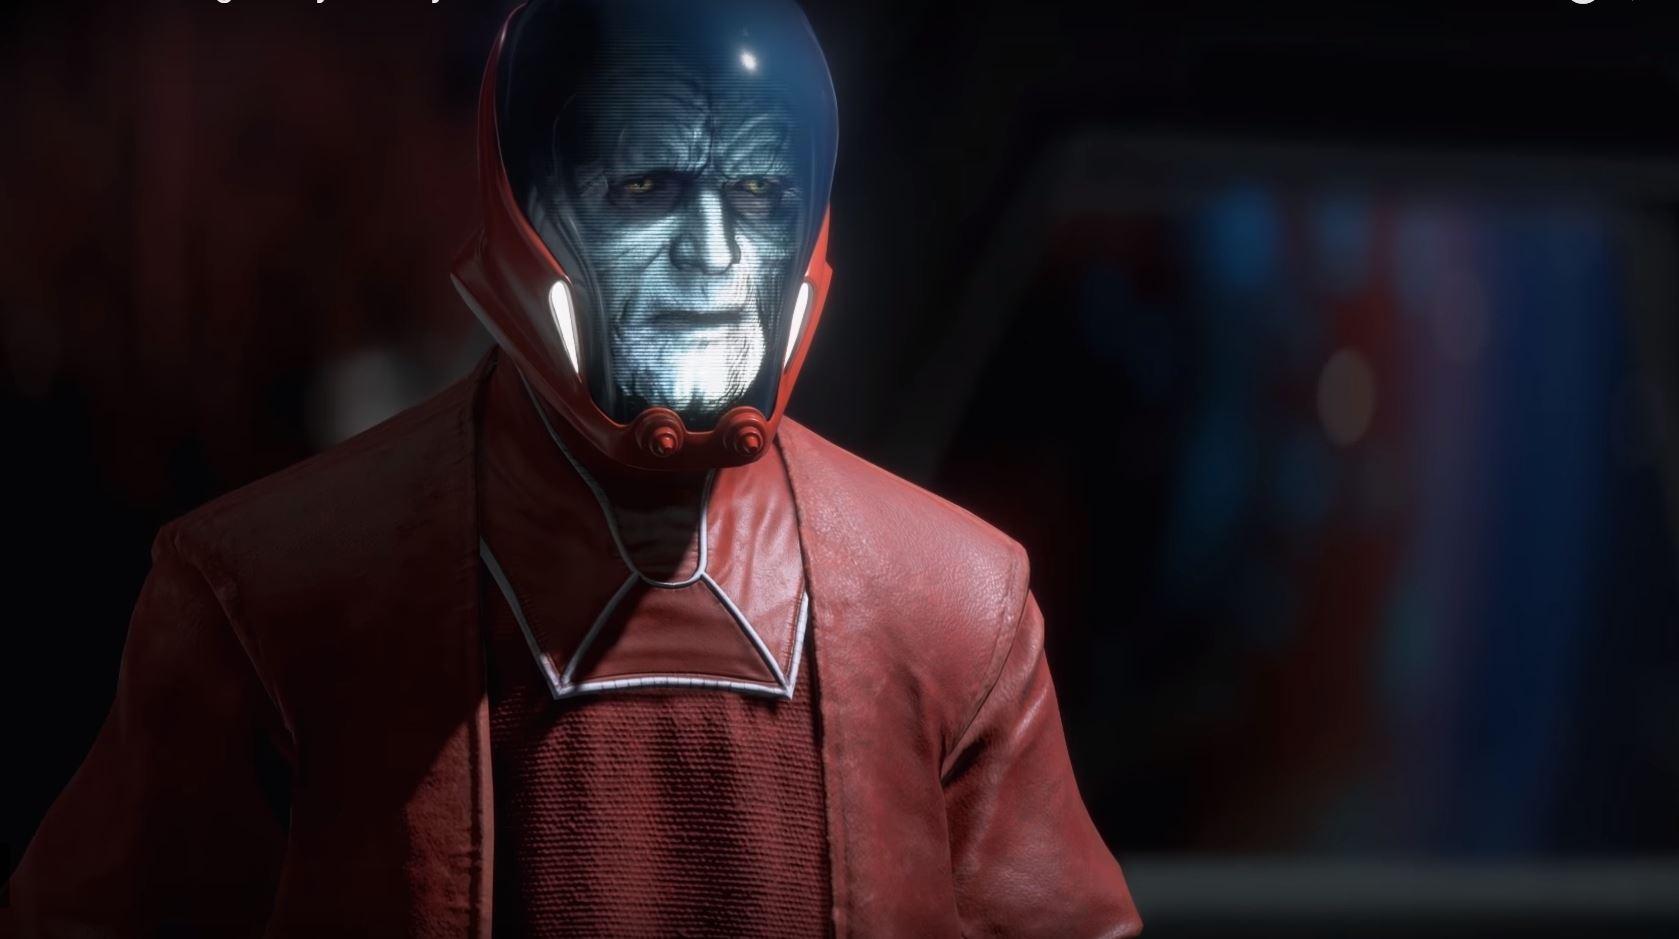 palpatine star wars battlefront ii storia droide sentinella